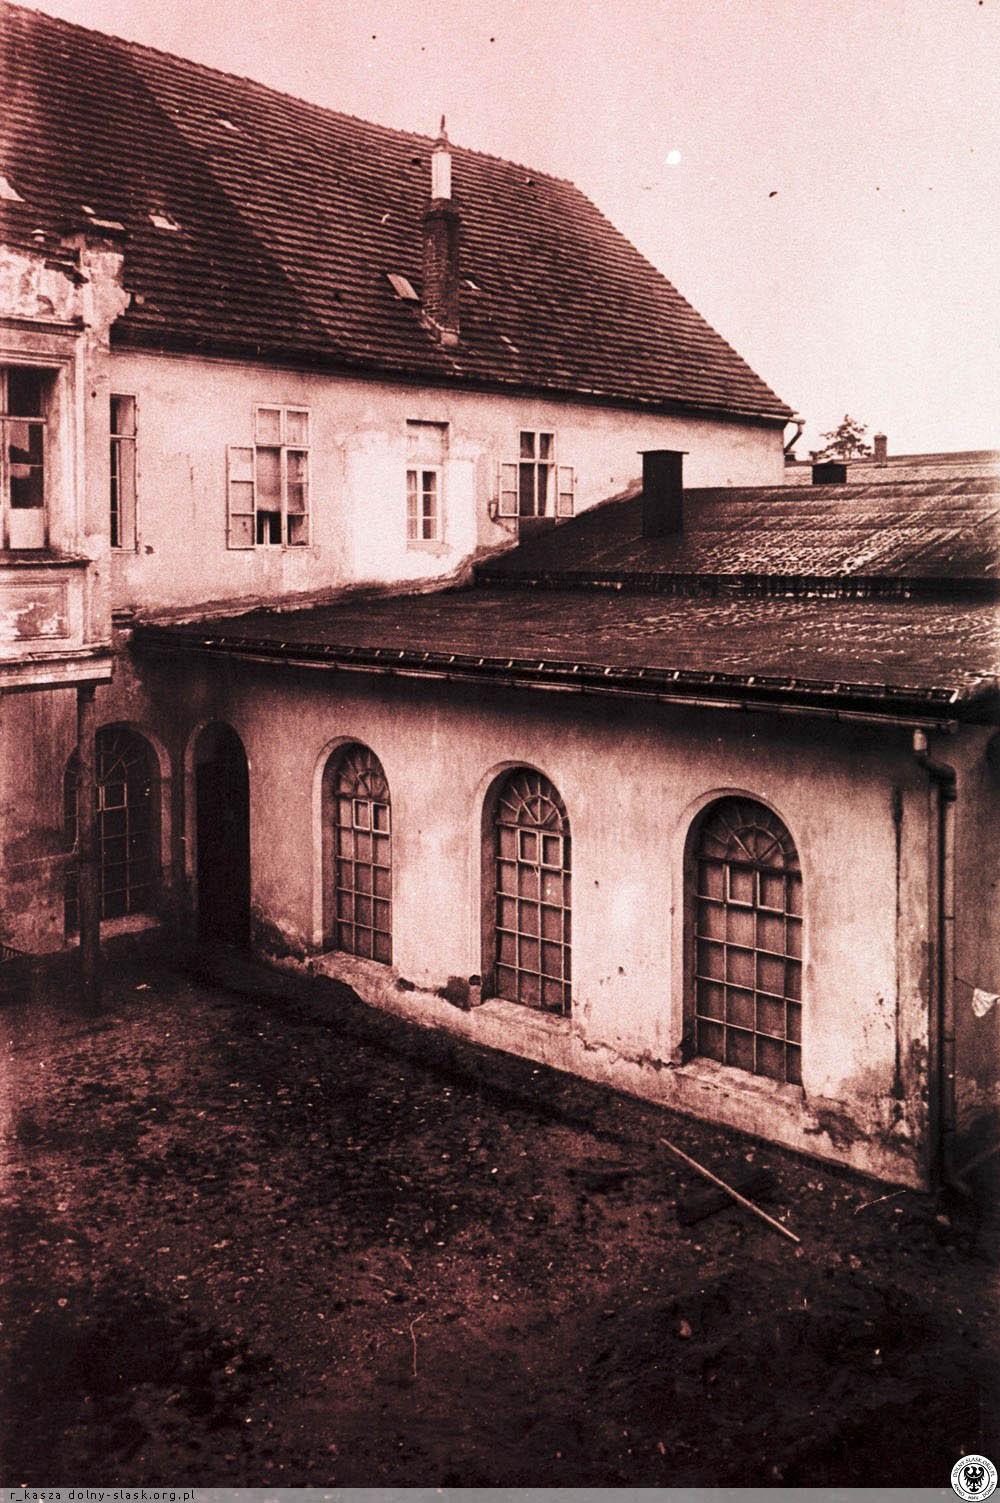 Frotex Building circa 1926. Polska.org.pl